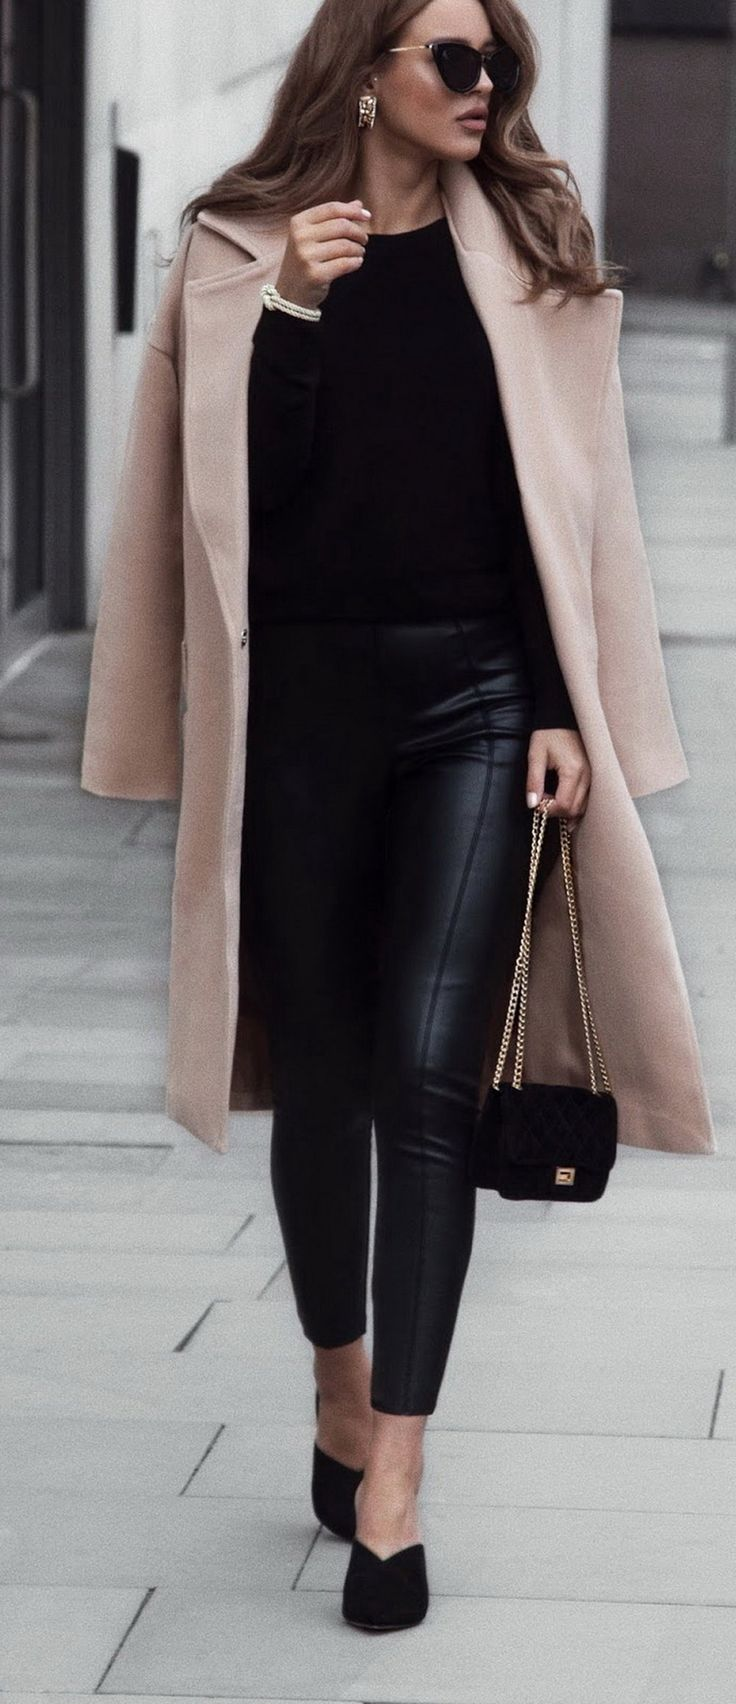 Coat (Here) Lather Pants (Here) Sunglasses (Here) Heels (Here)